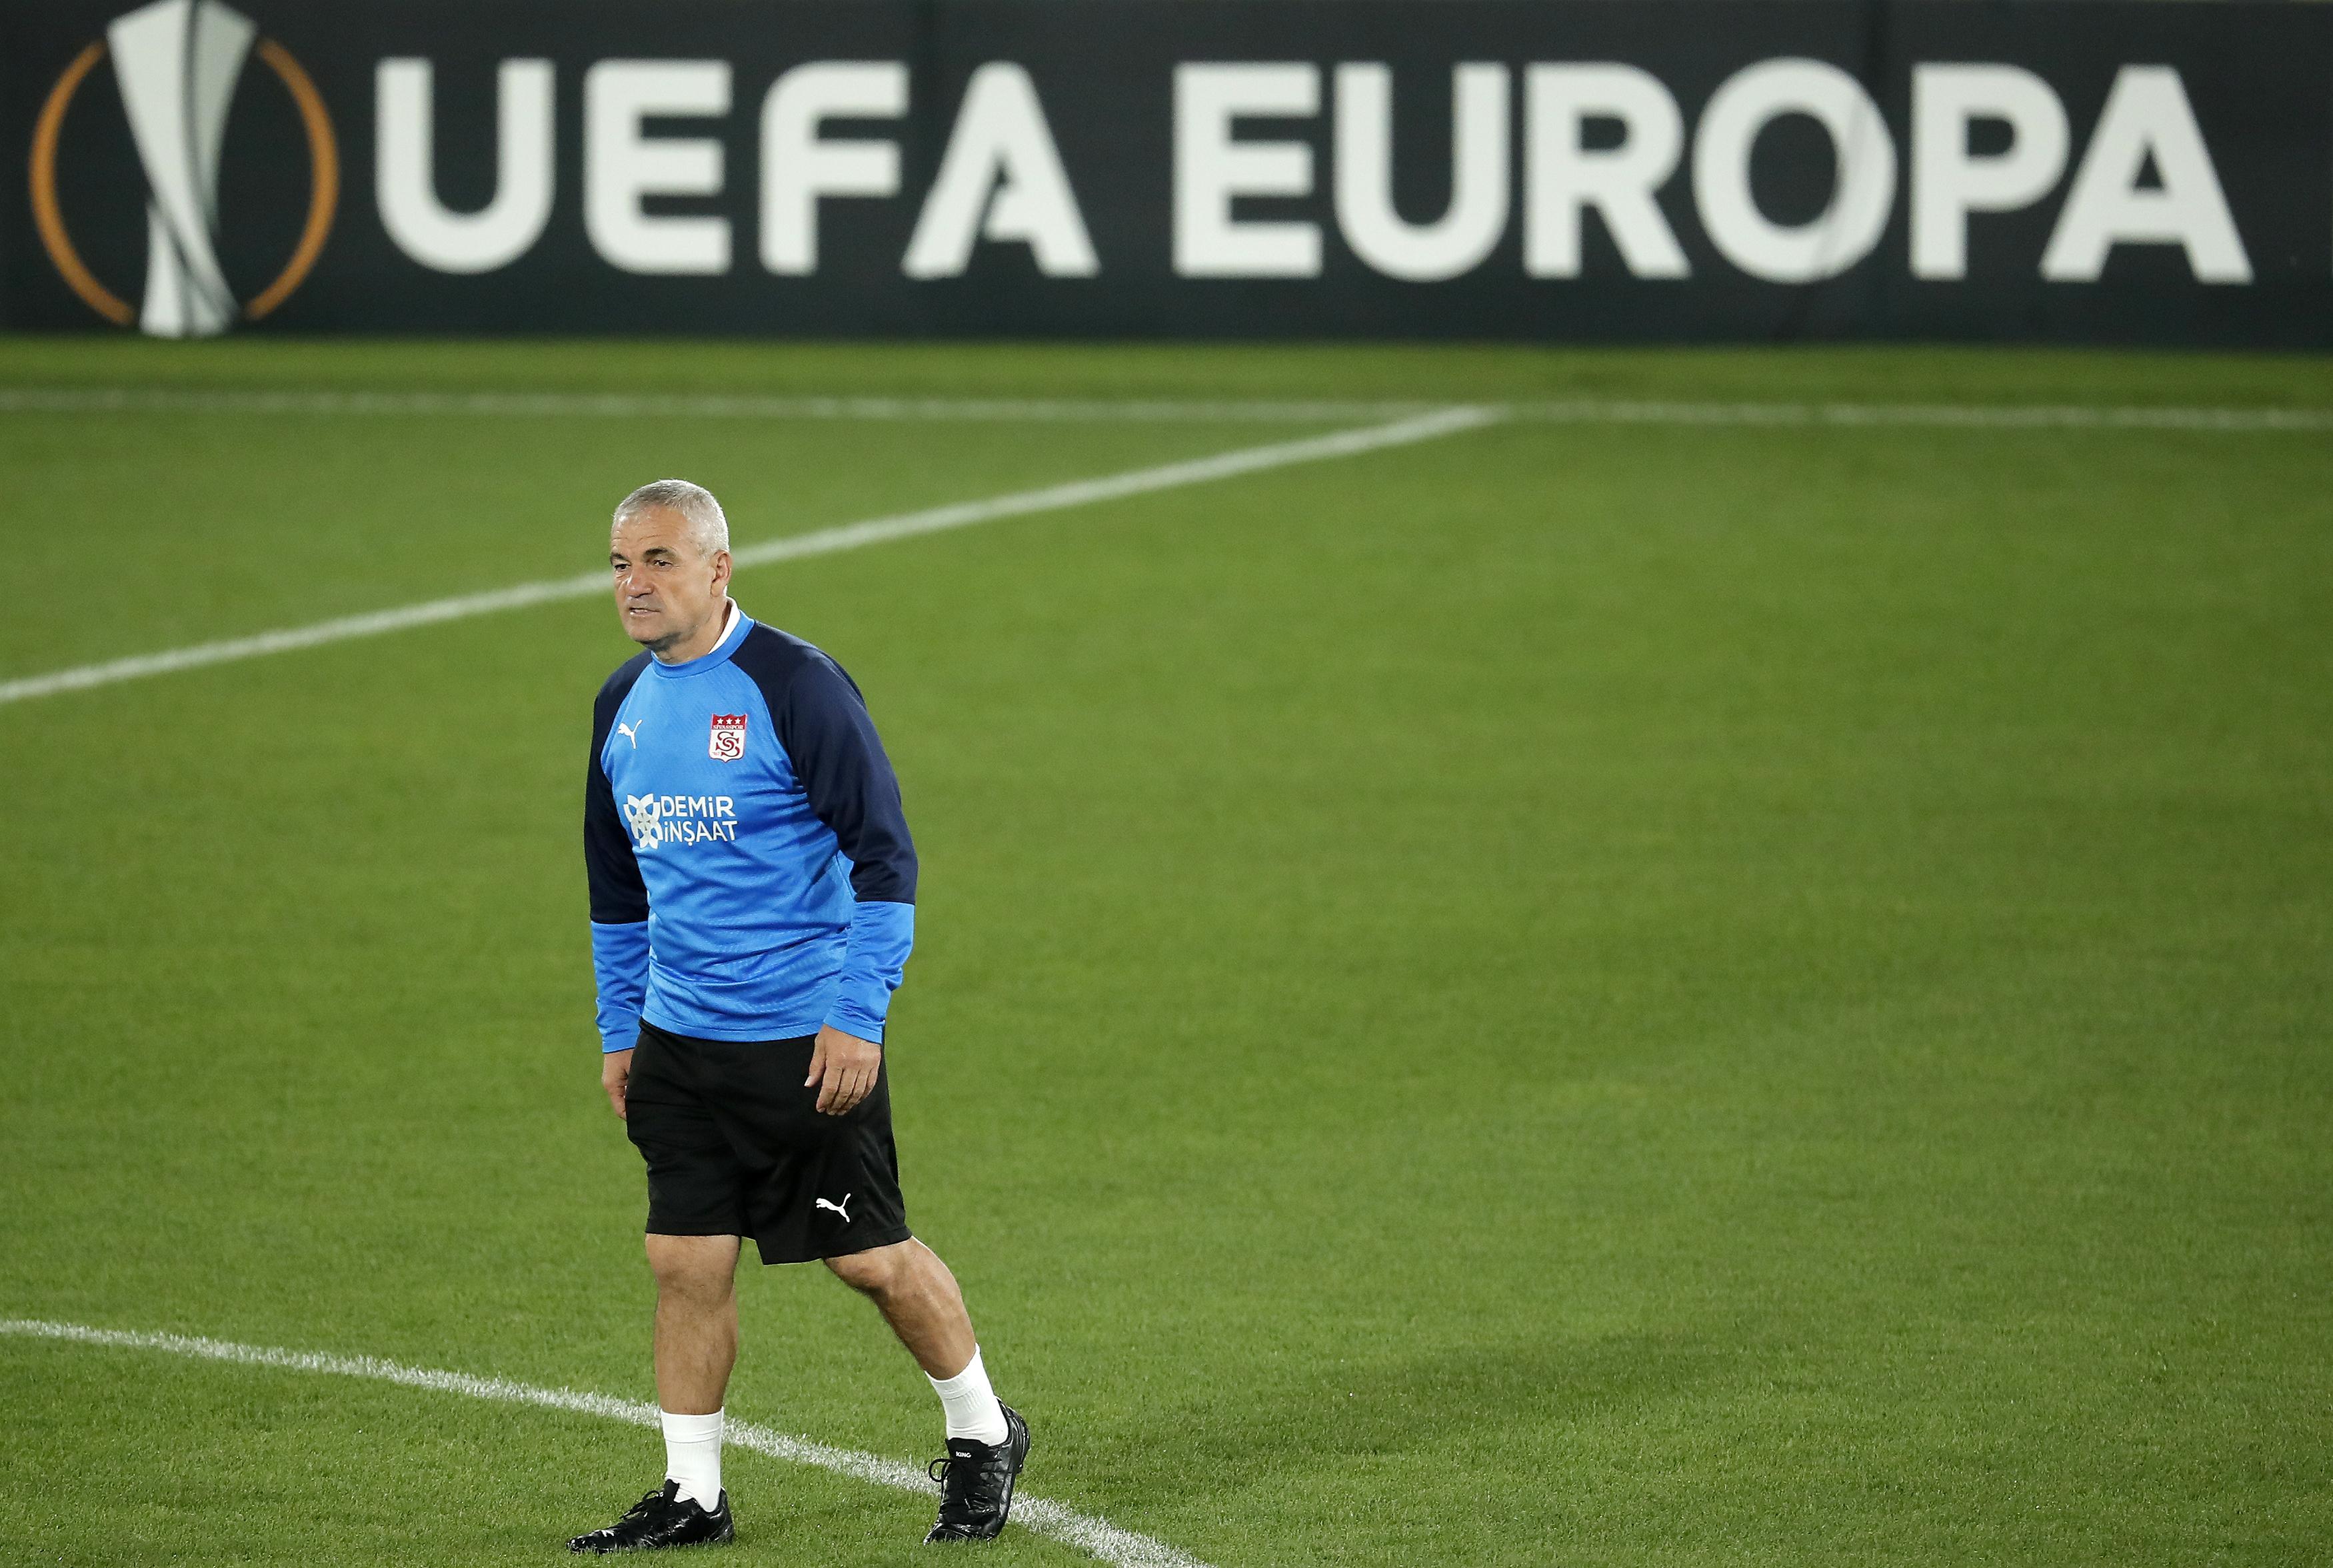 Ahead of Villarreal v Sivasspor - UEFA Europa League